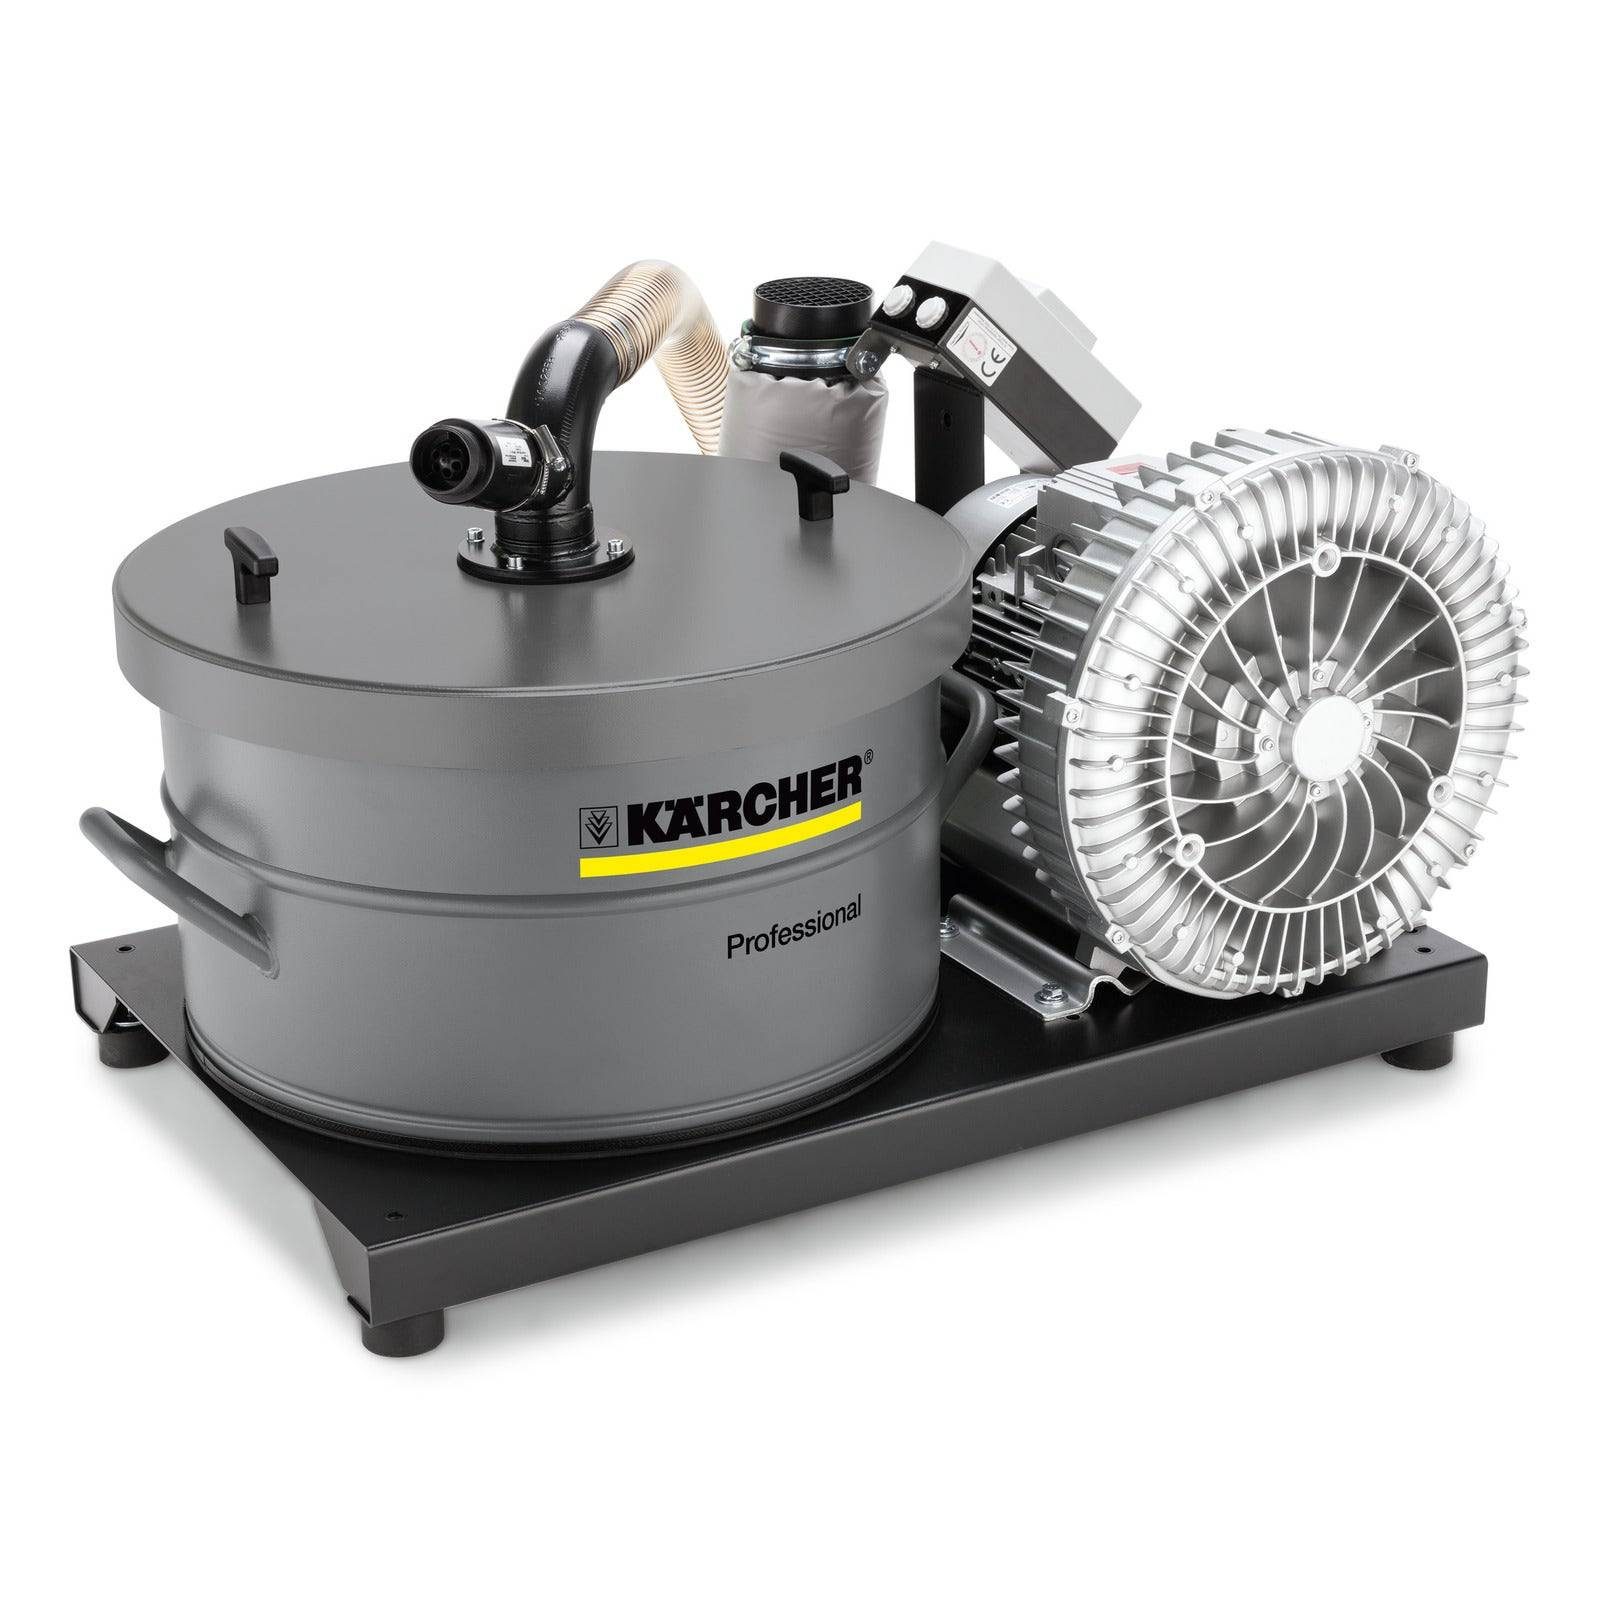 Kärcher Aspirateur industriel Ivr-B 50/30